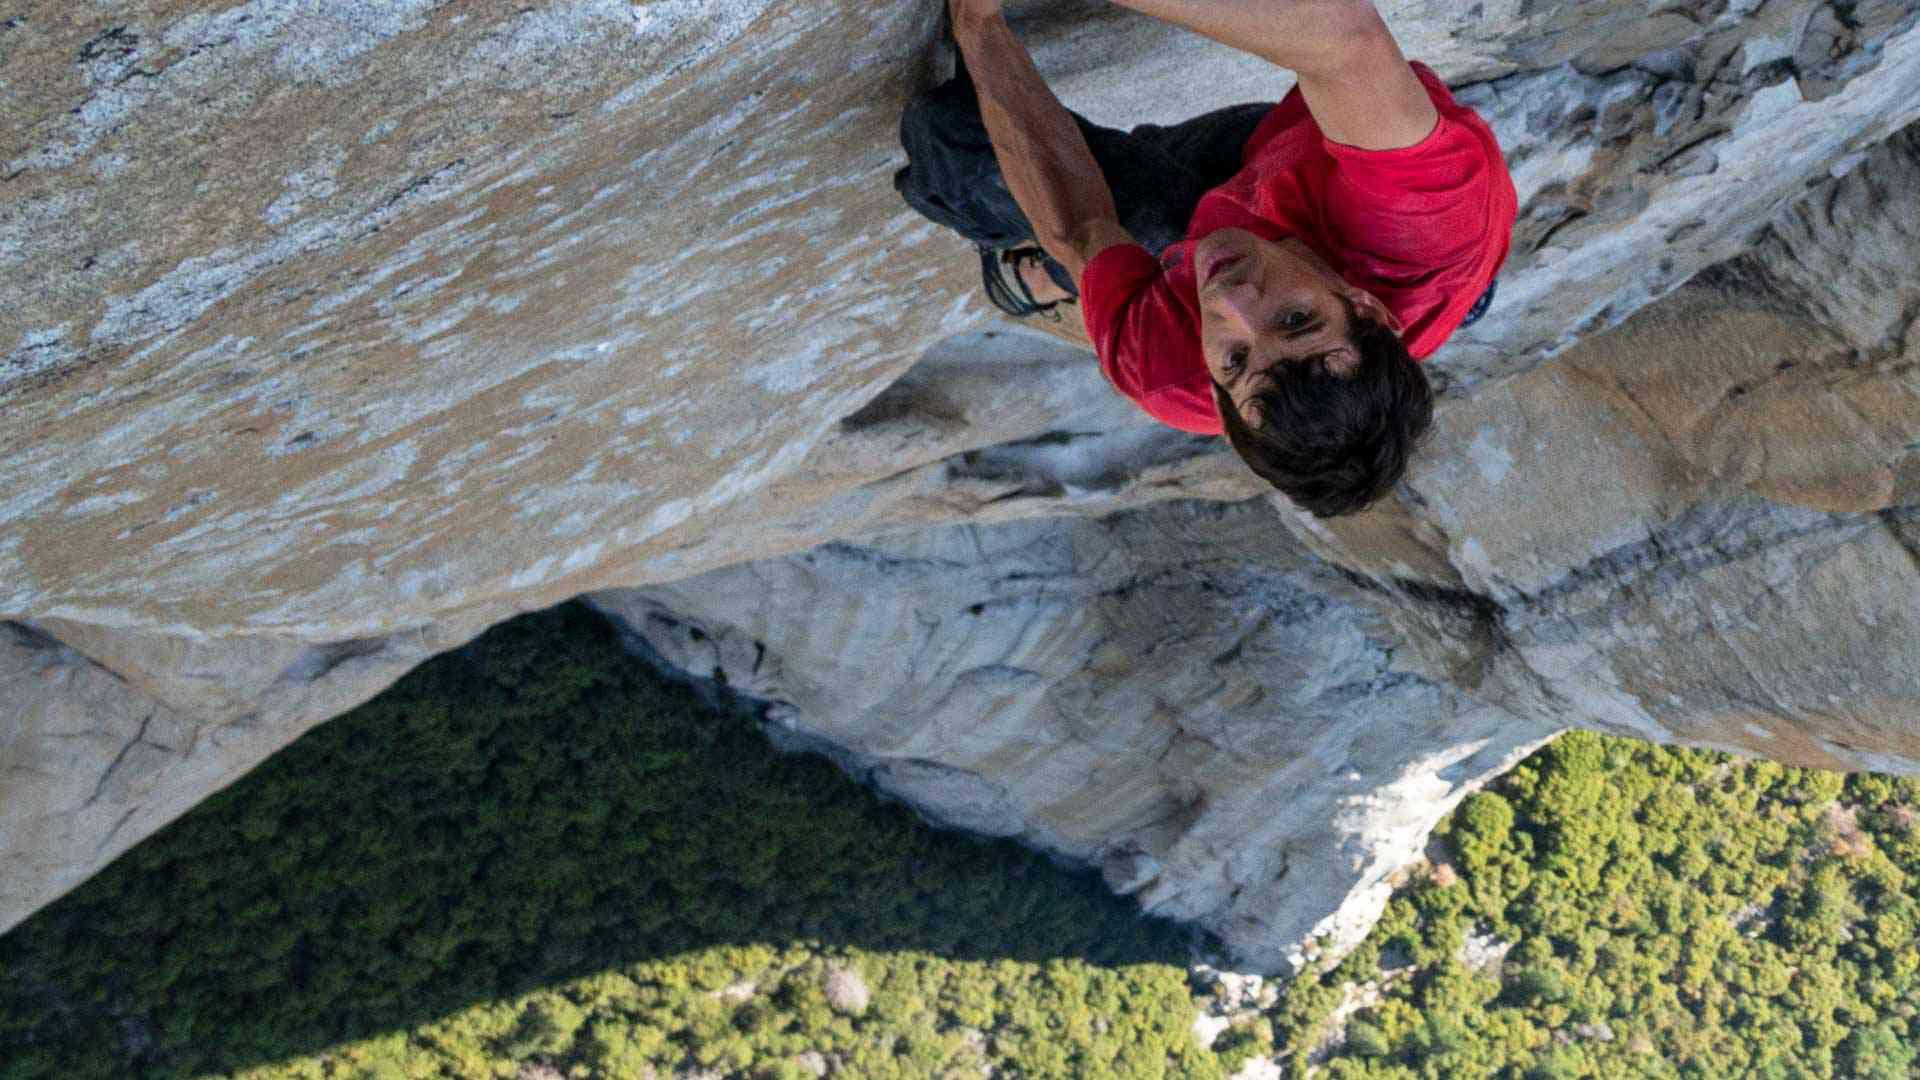 Alex Honnold climbing El Capitan in Free Solo (2018)